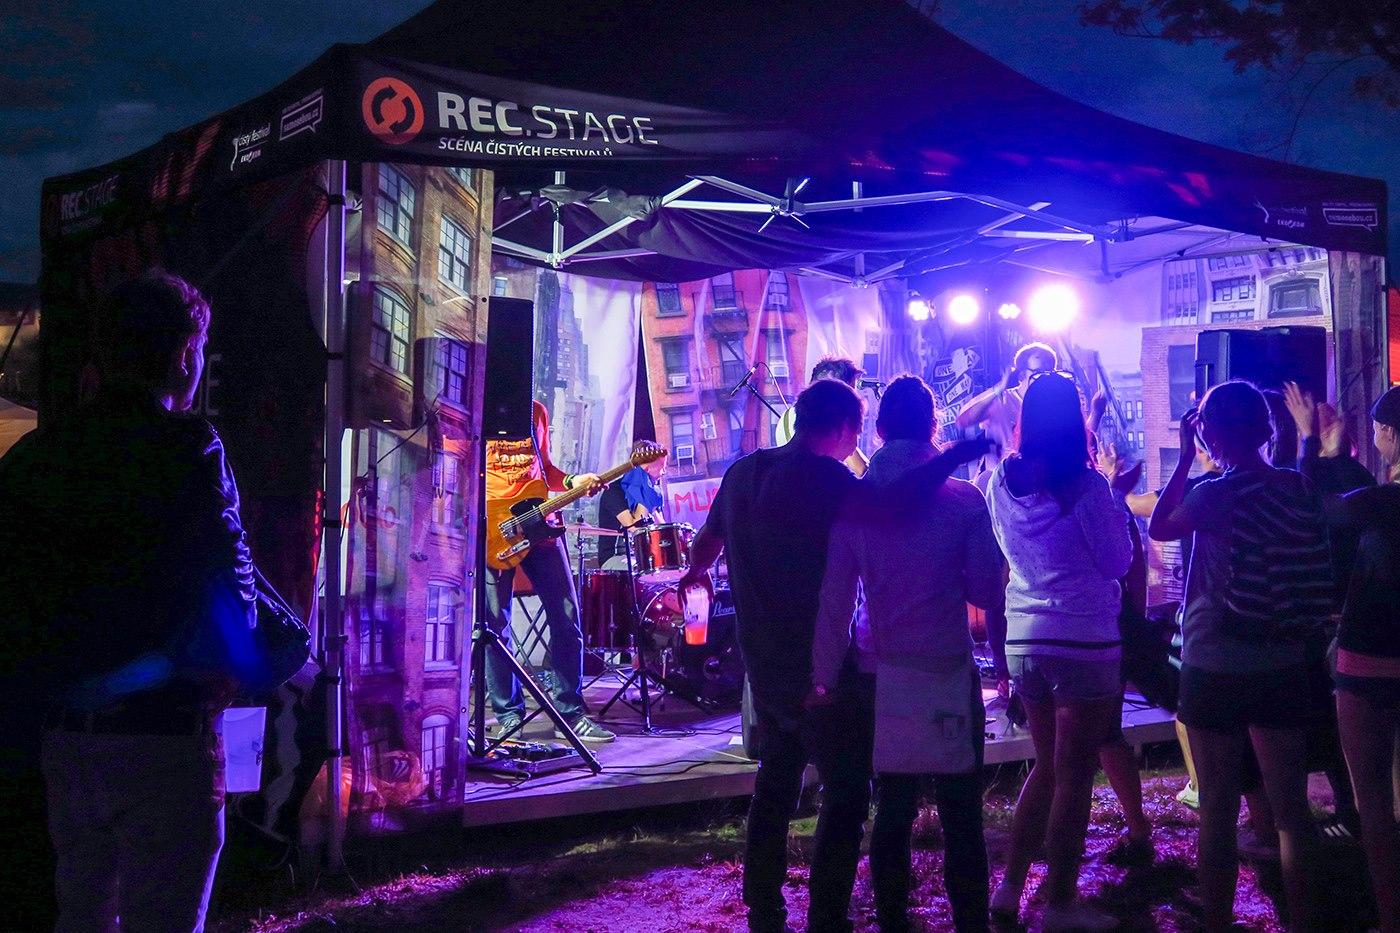 cisty_festival_projekt_samosebou_stage_koncert_festak